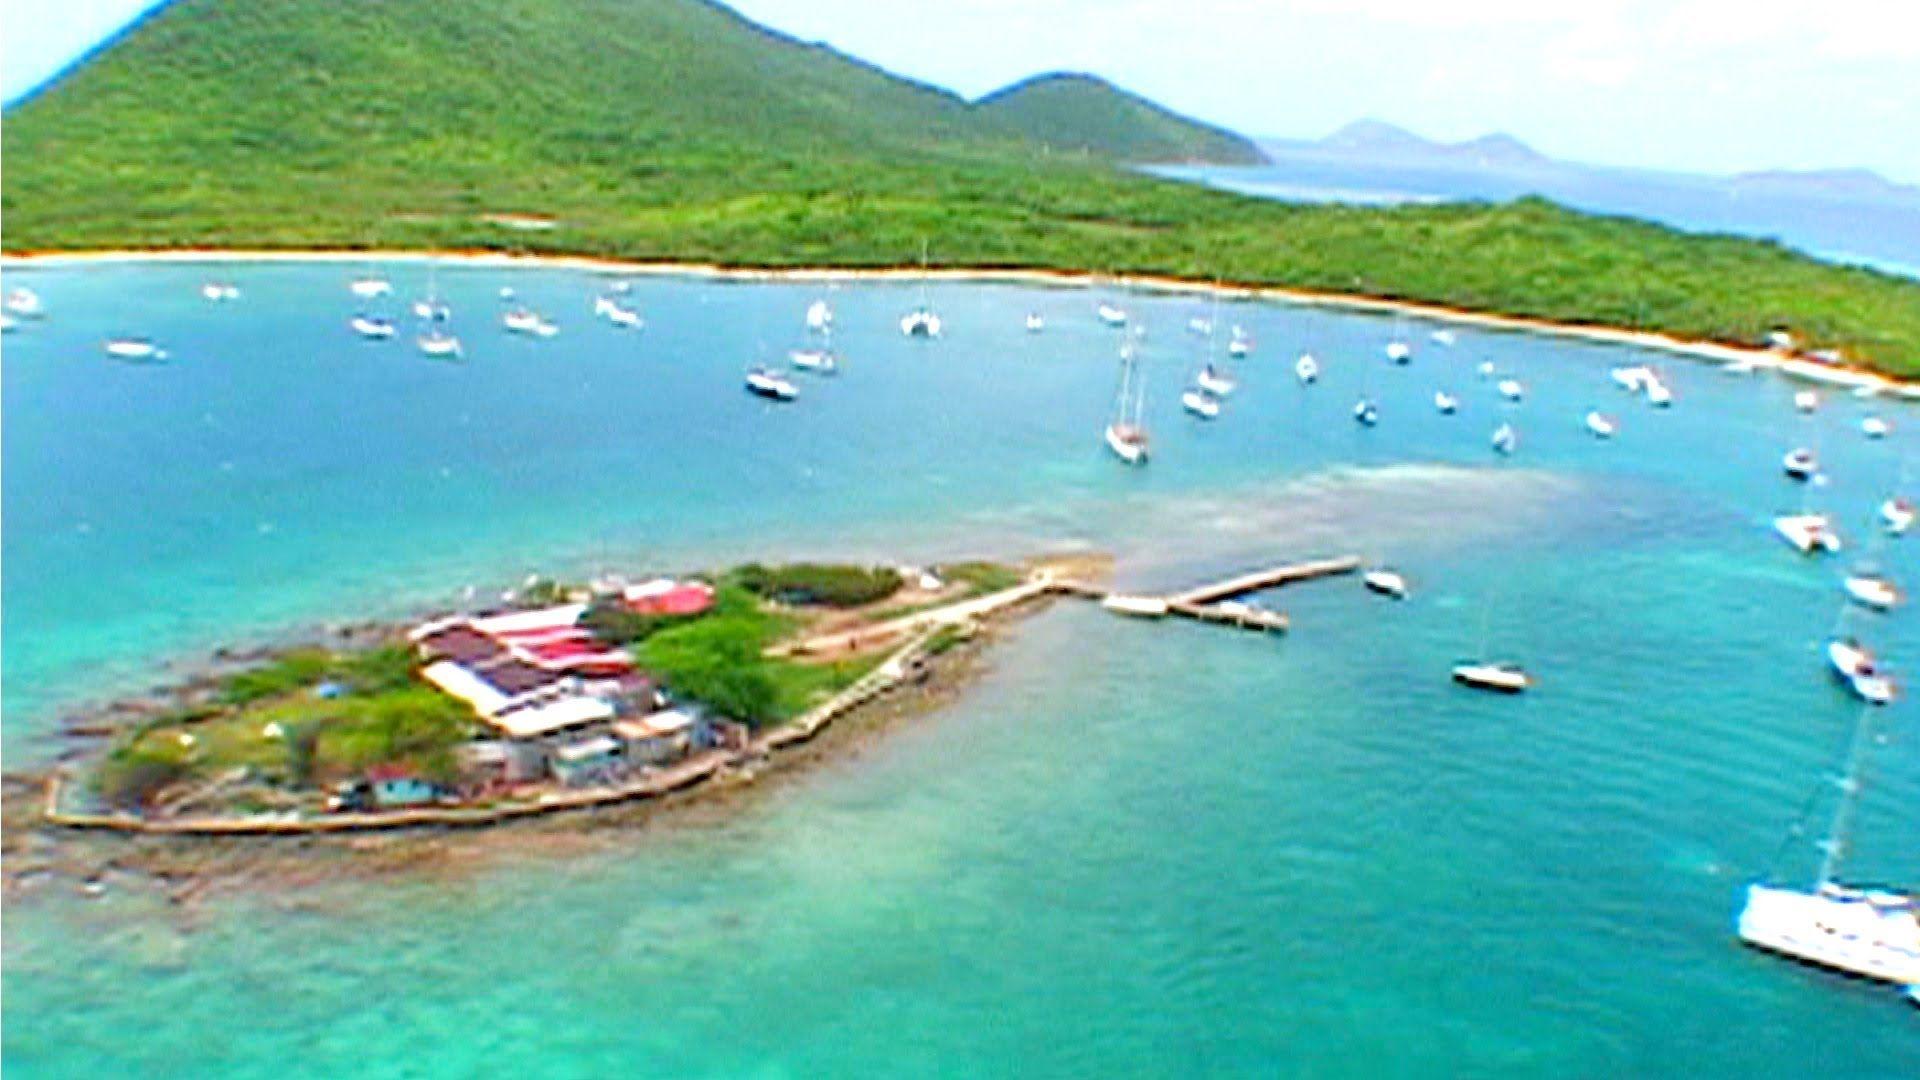 The Last Resort Tortola British Virgin Islands Pinned By Vintagevirginislan Virgin Islands Vacation British Virgin Islands Vacations British Virgin Islands